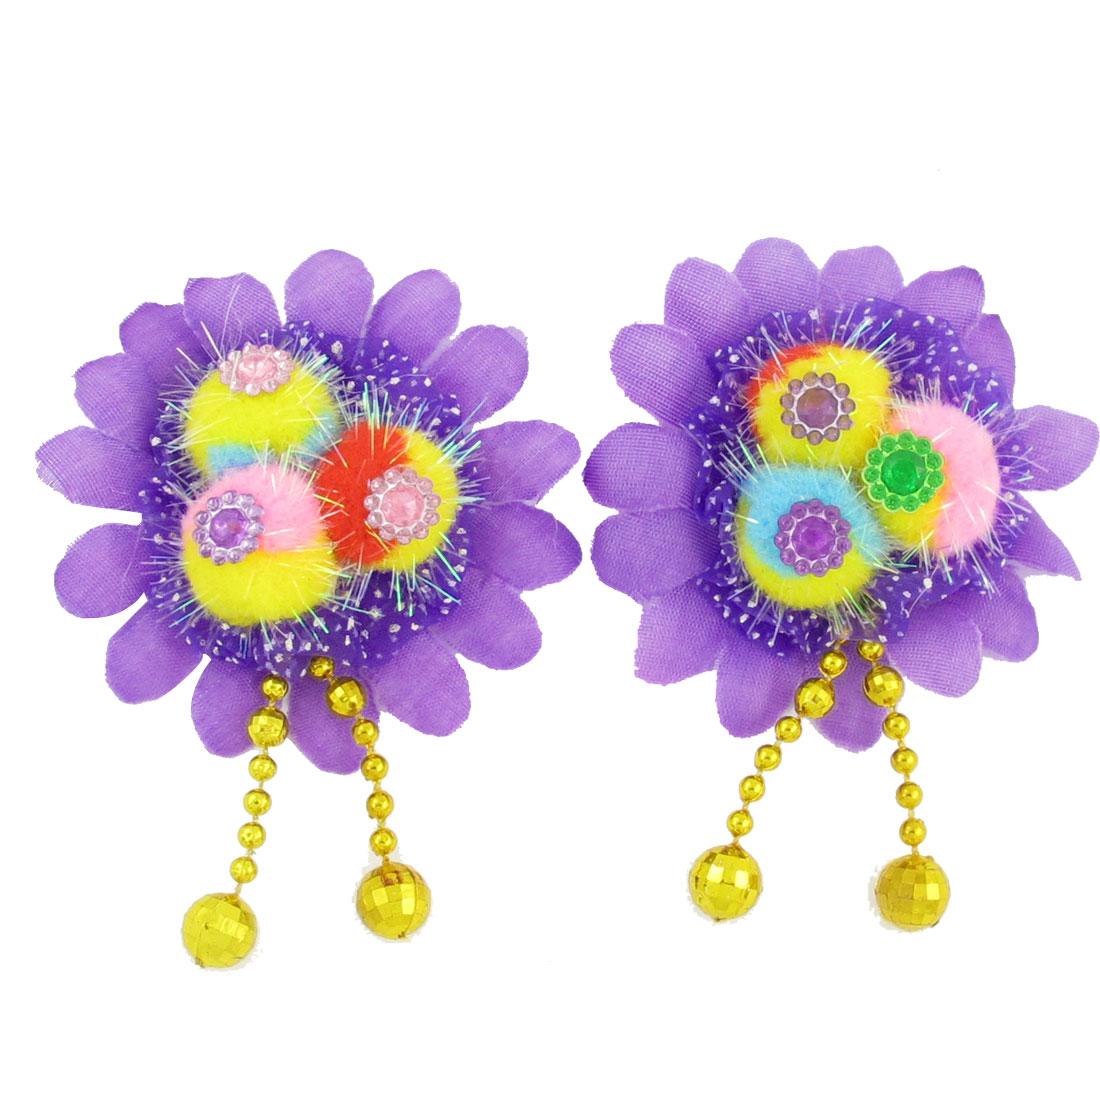 2 Pcs Purple Sunflower Decor Stretch Hair Tie Ponytail Holder for Girl